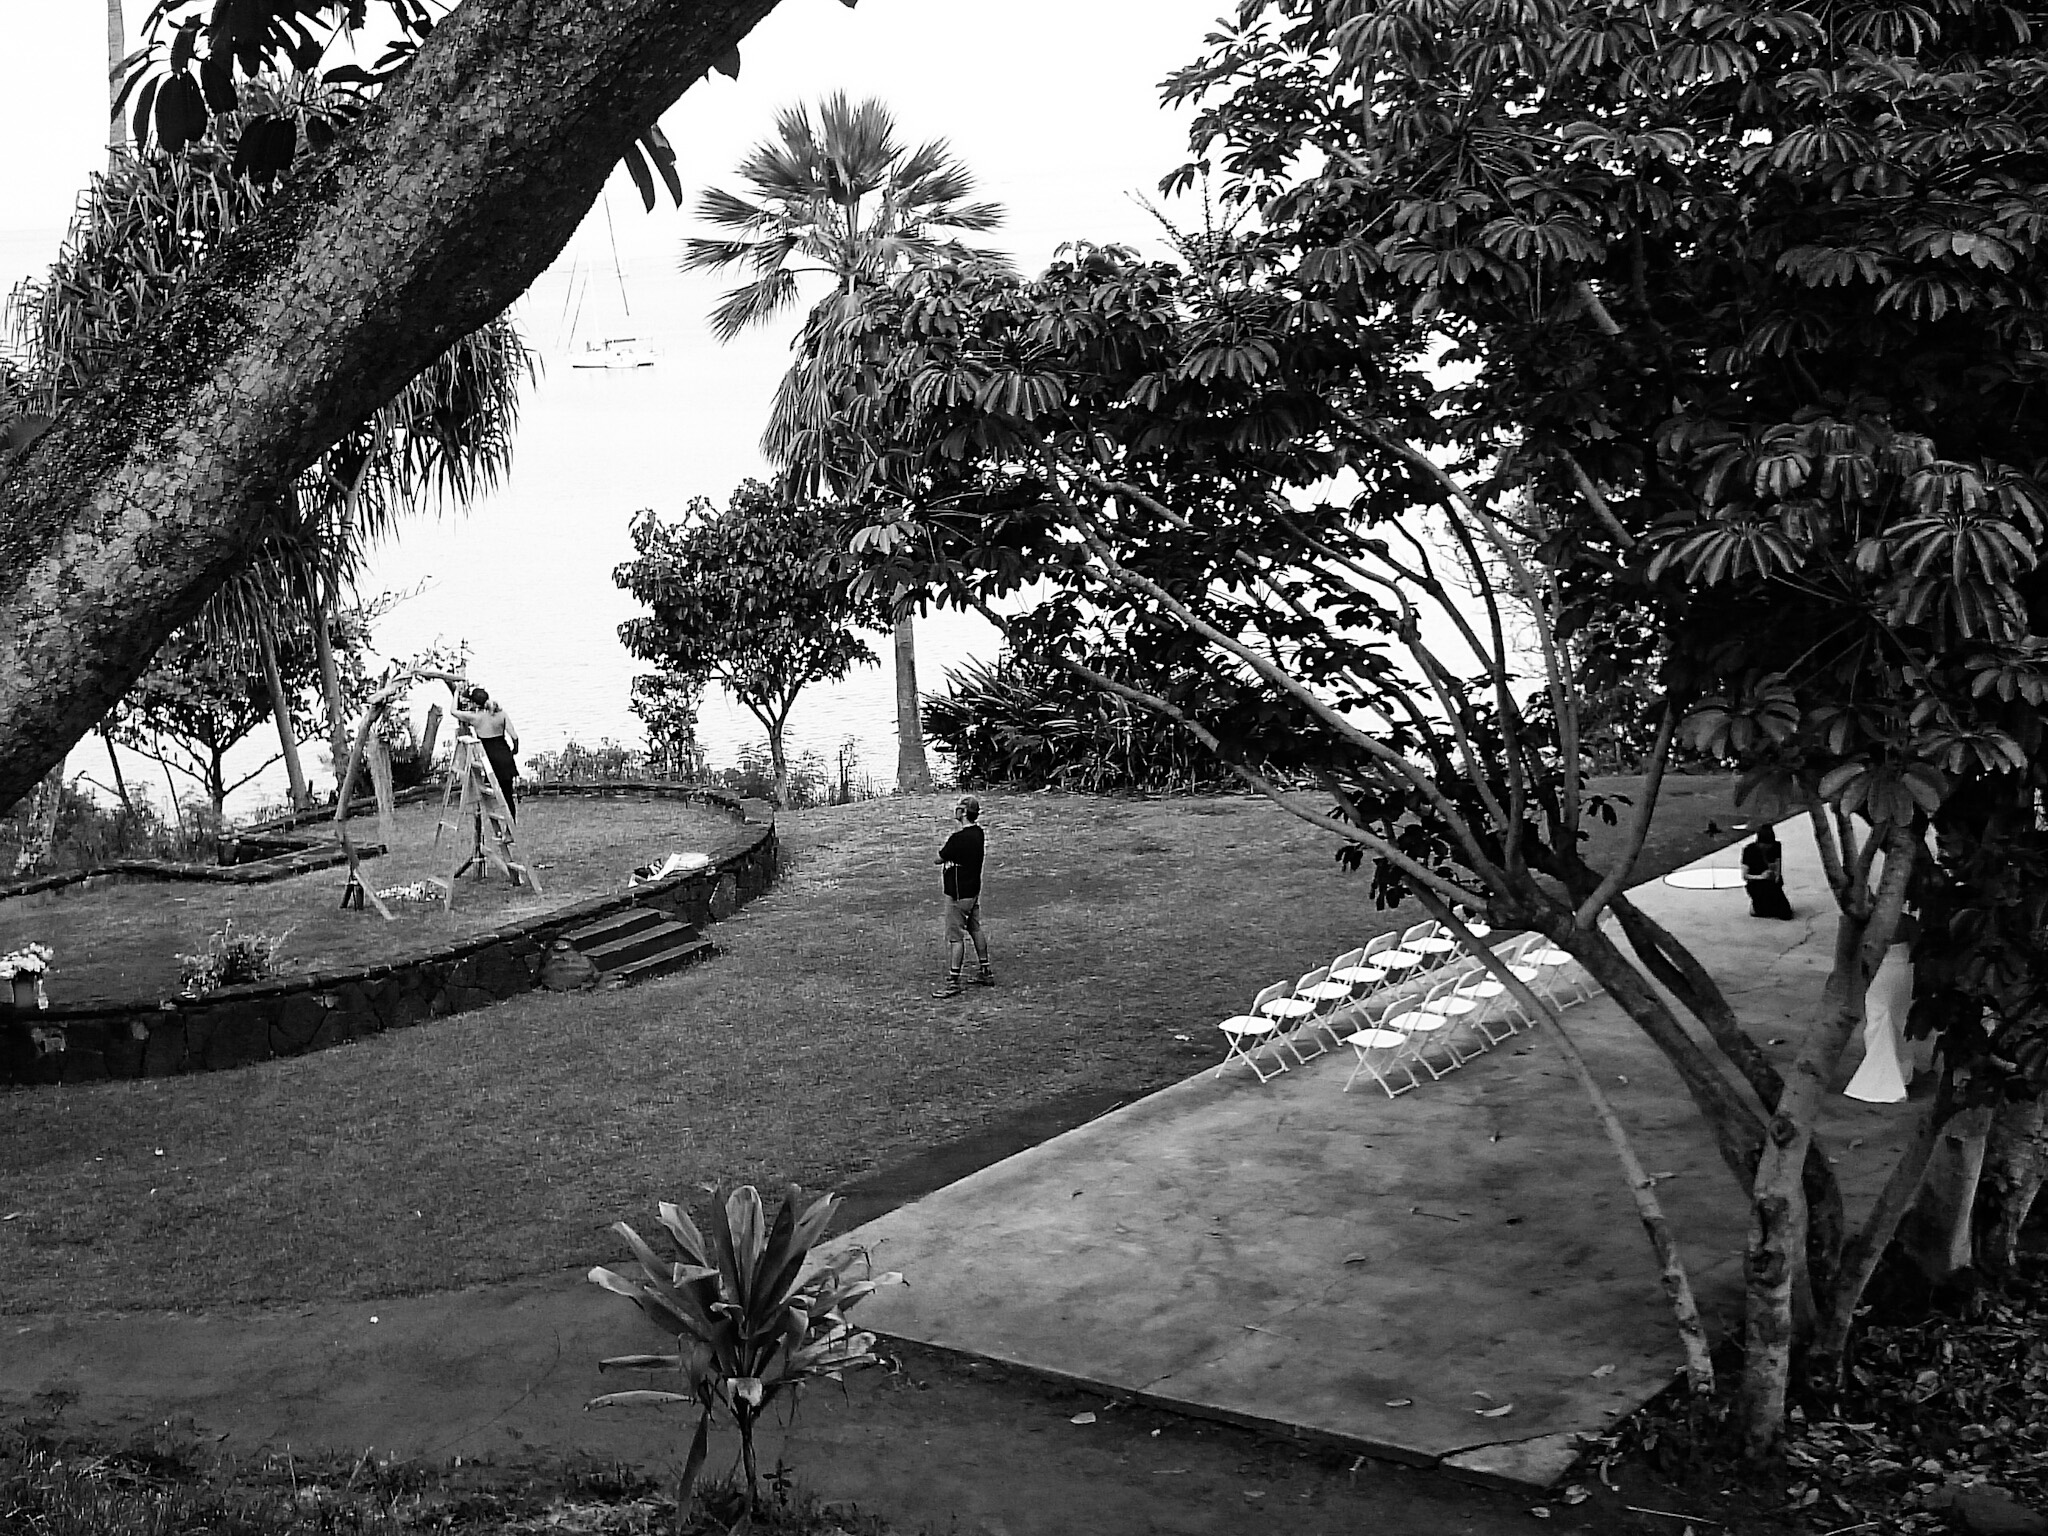 Preparing a wedding - Heeia park, Oahu